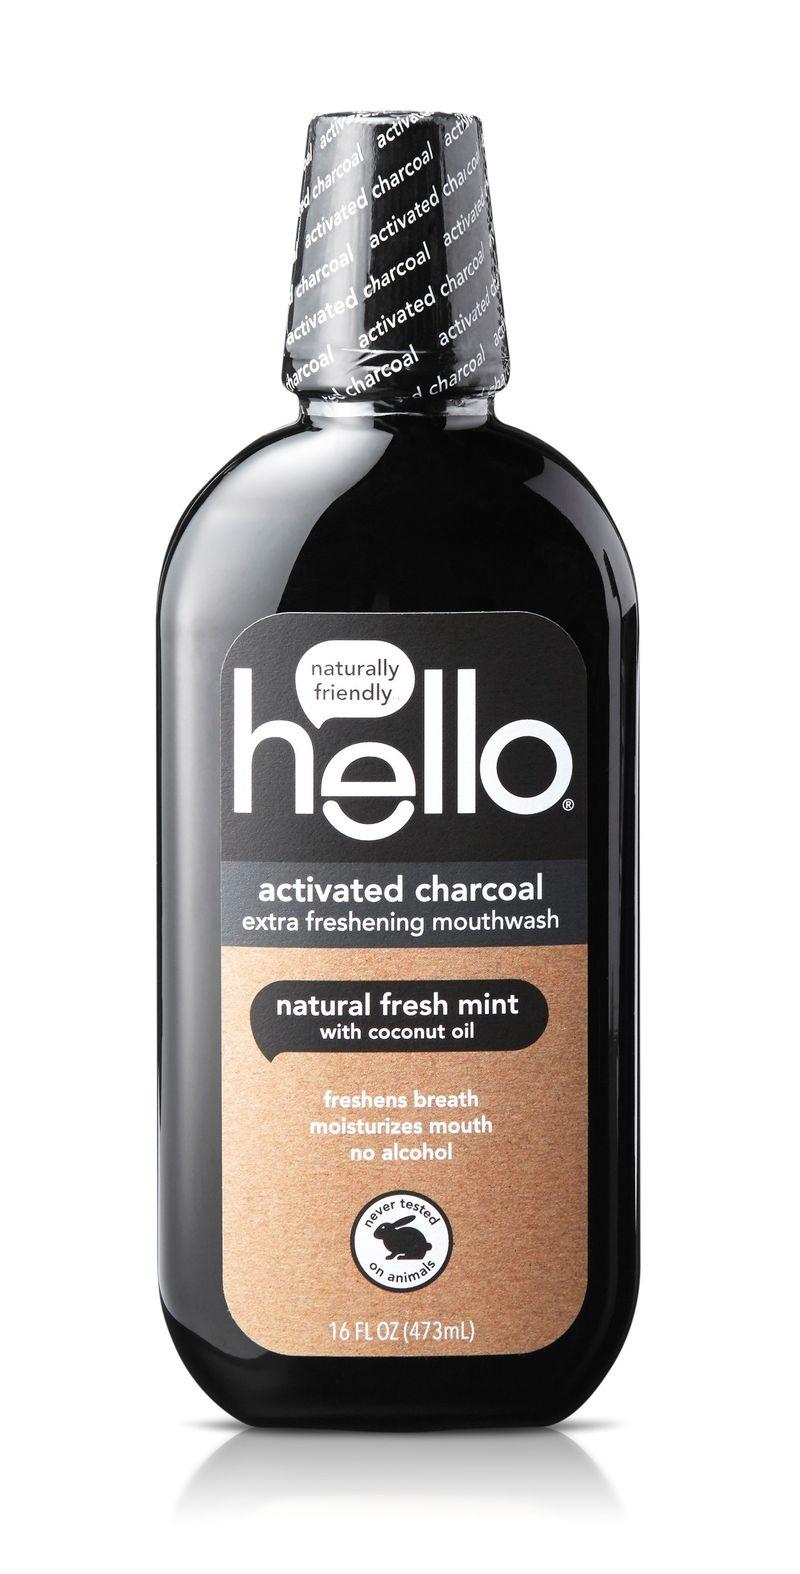 Refreshing Charcoal Mouthwashes